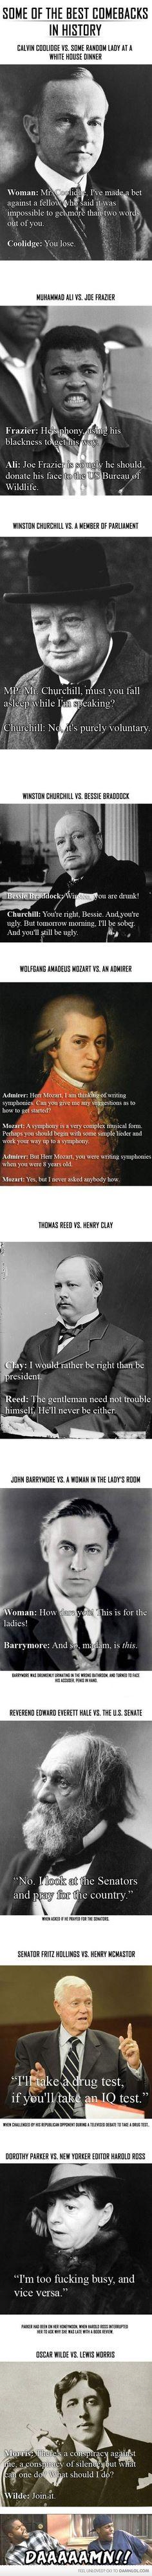 Historical comebacks..